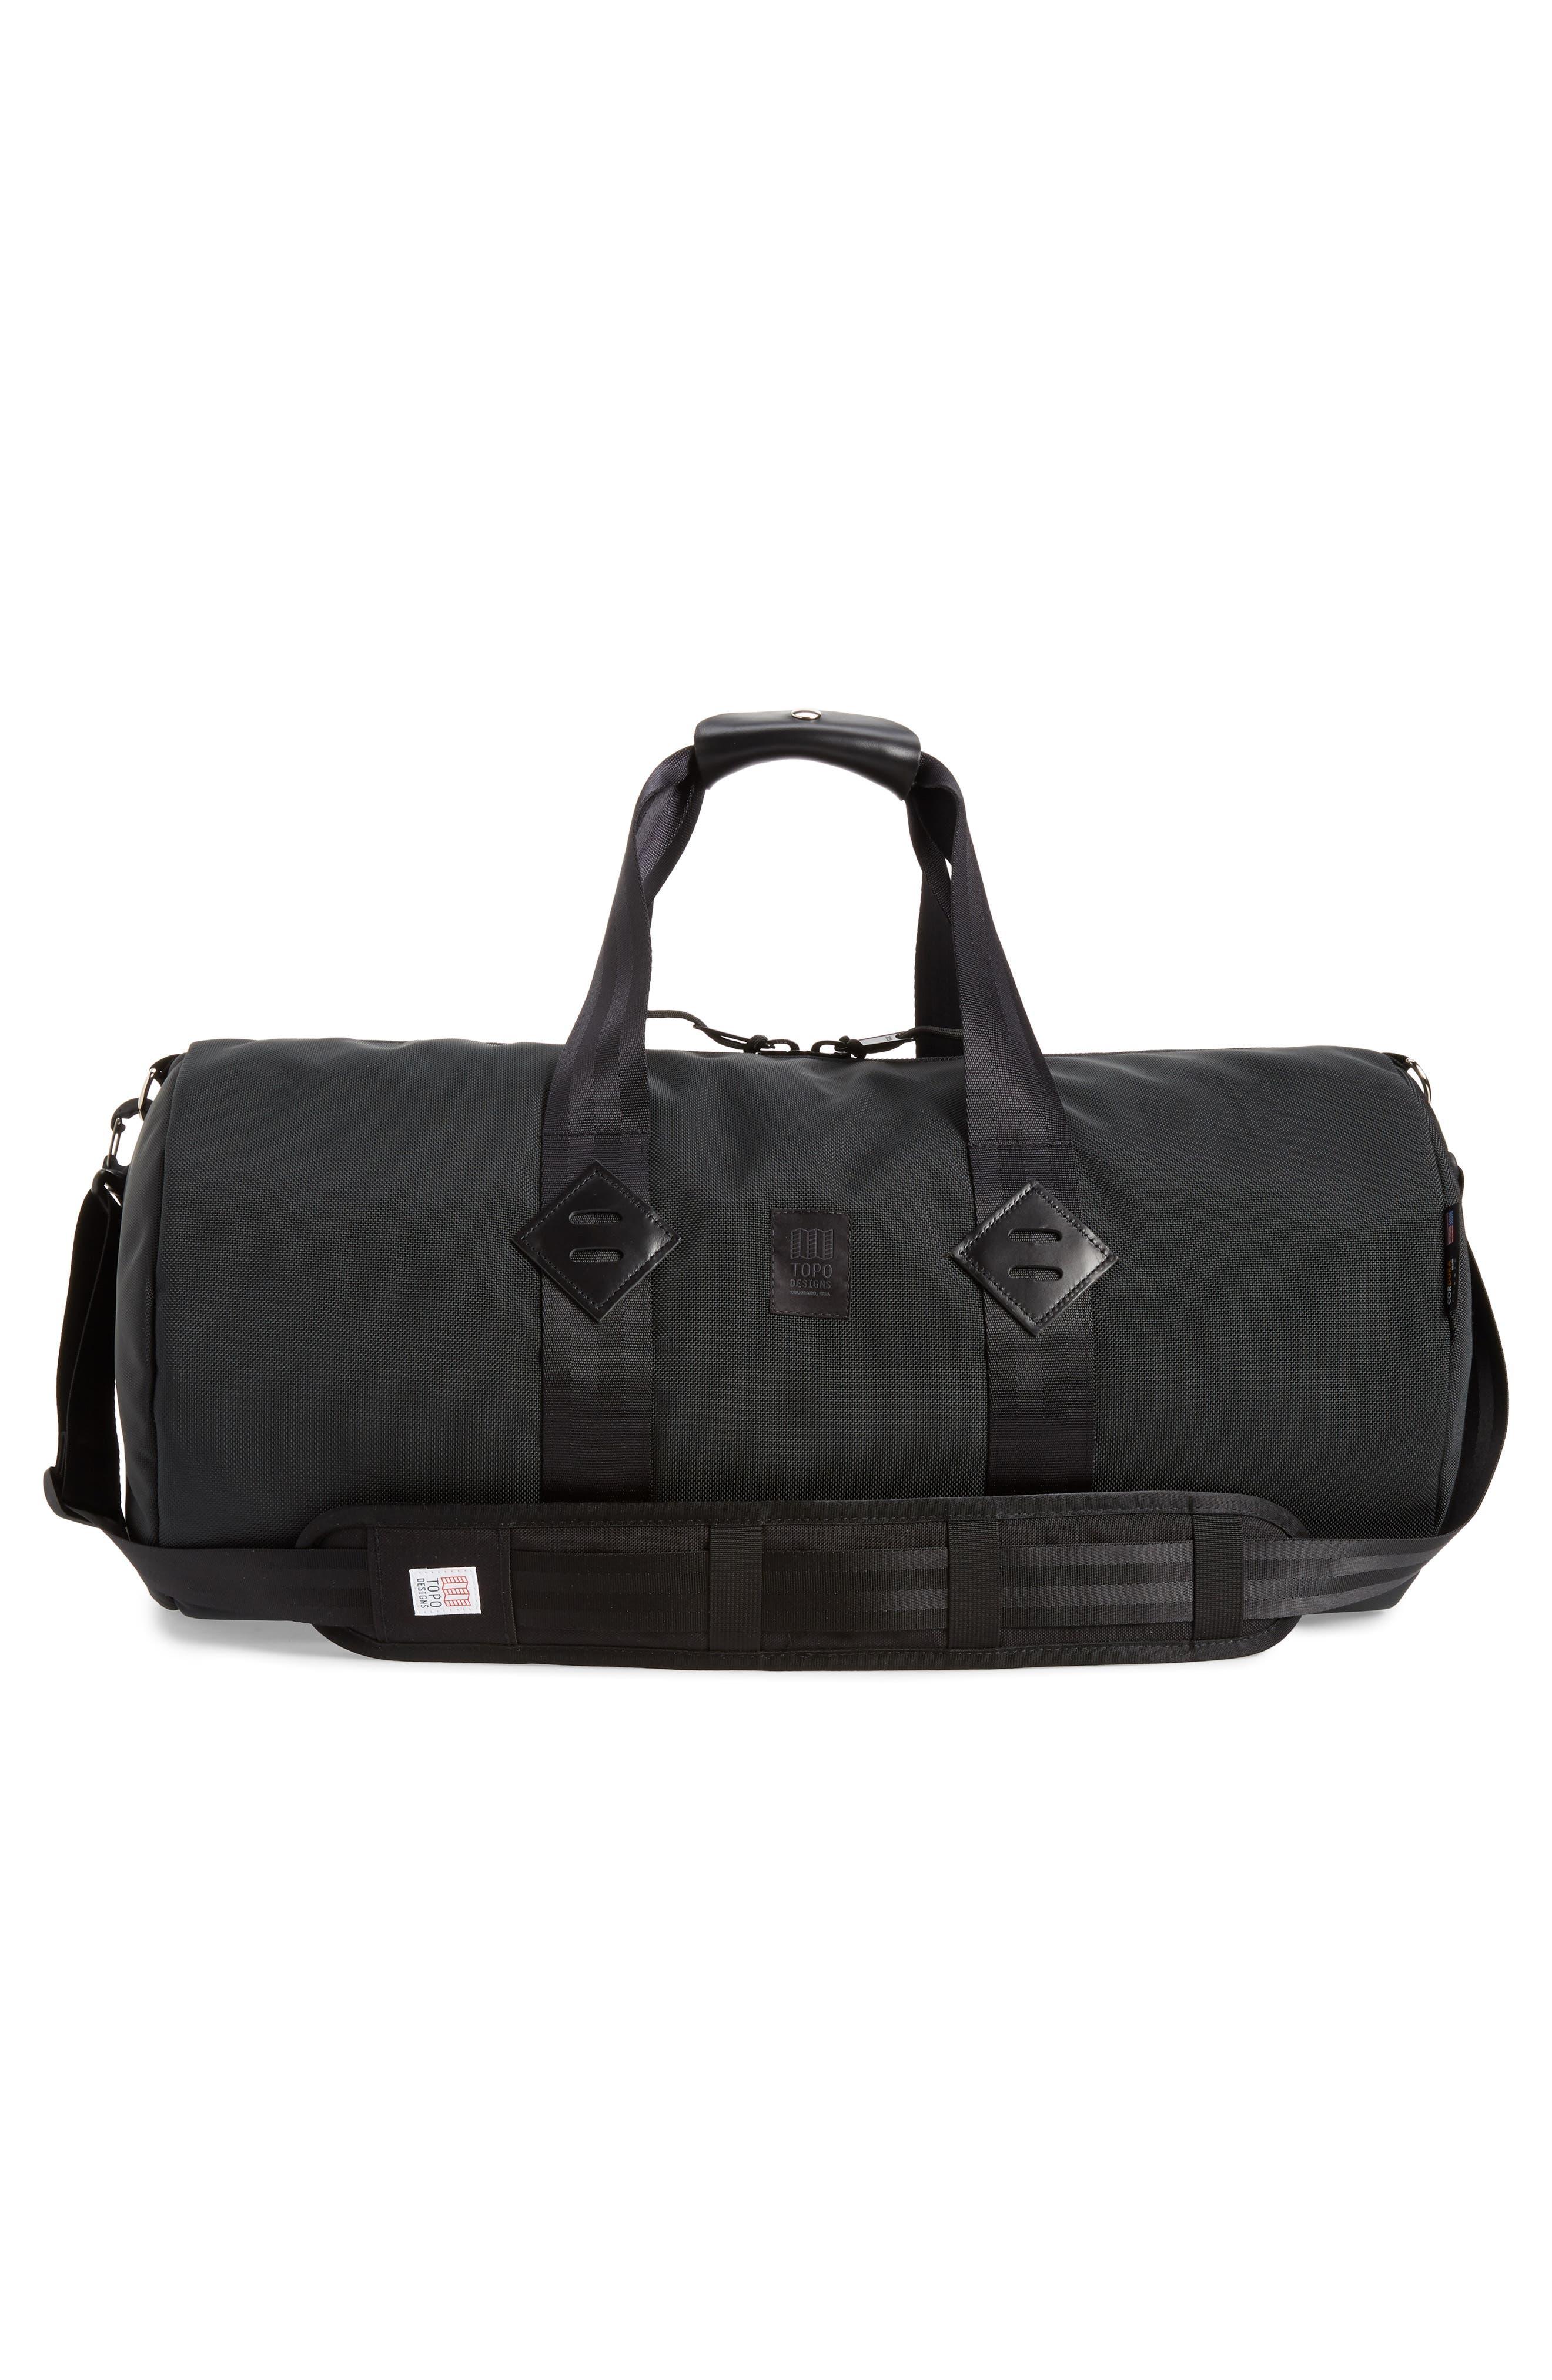 TOPO DESIGNS, Classic Duffle Bag, Alternate thumbnail 2, color, BALLISTIC BLACK/ BLACK LEATHER